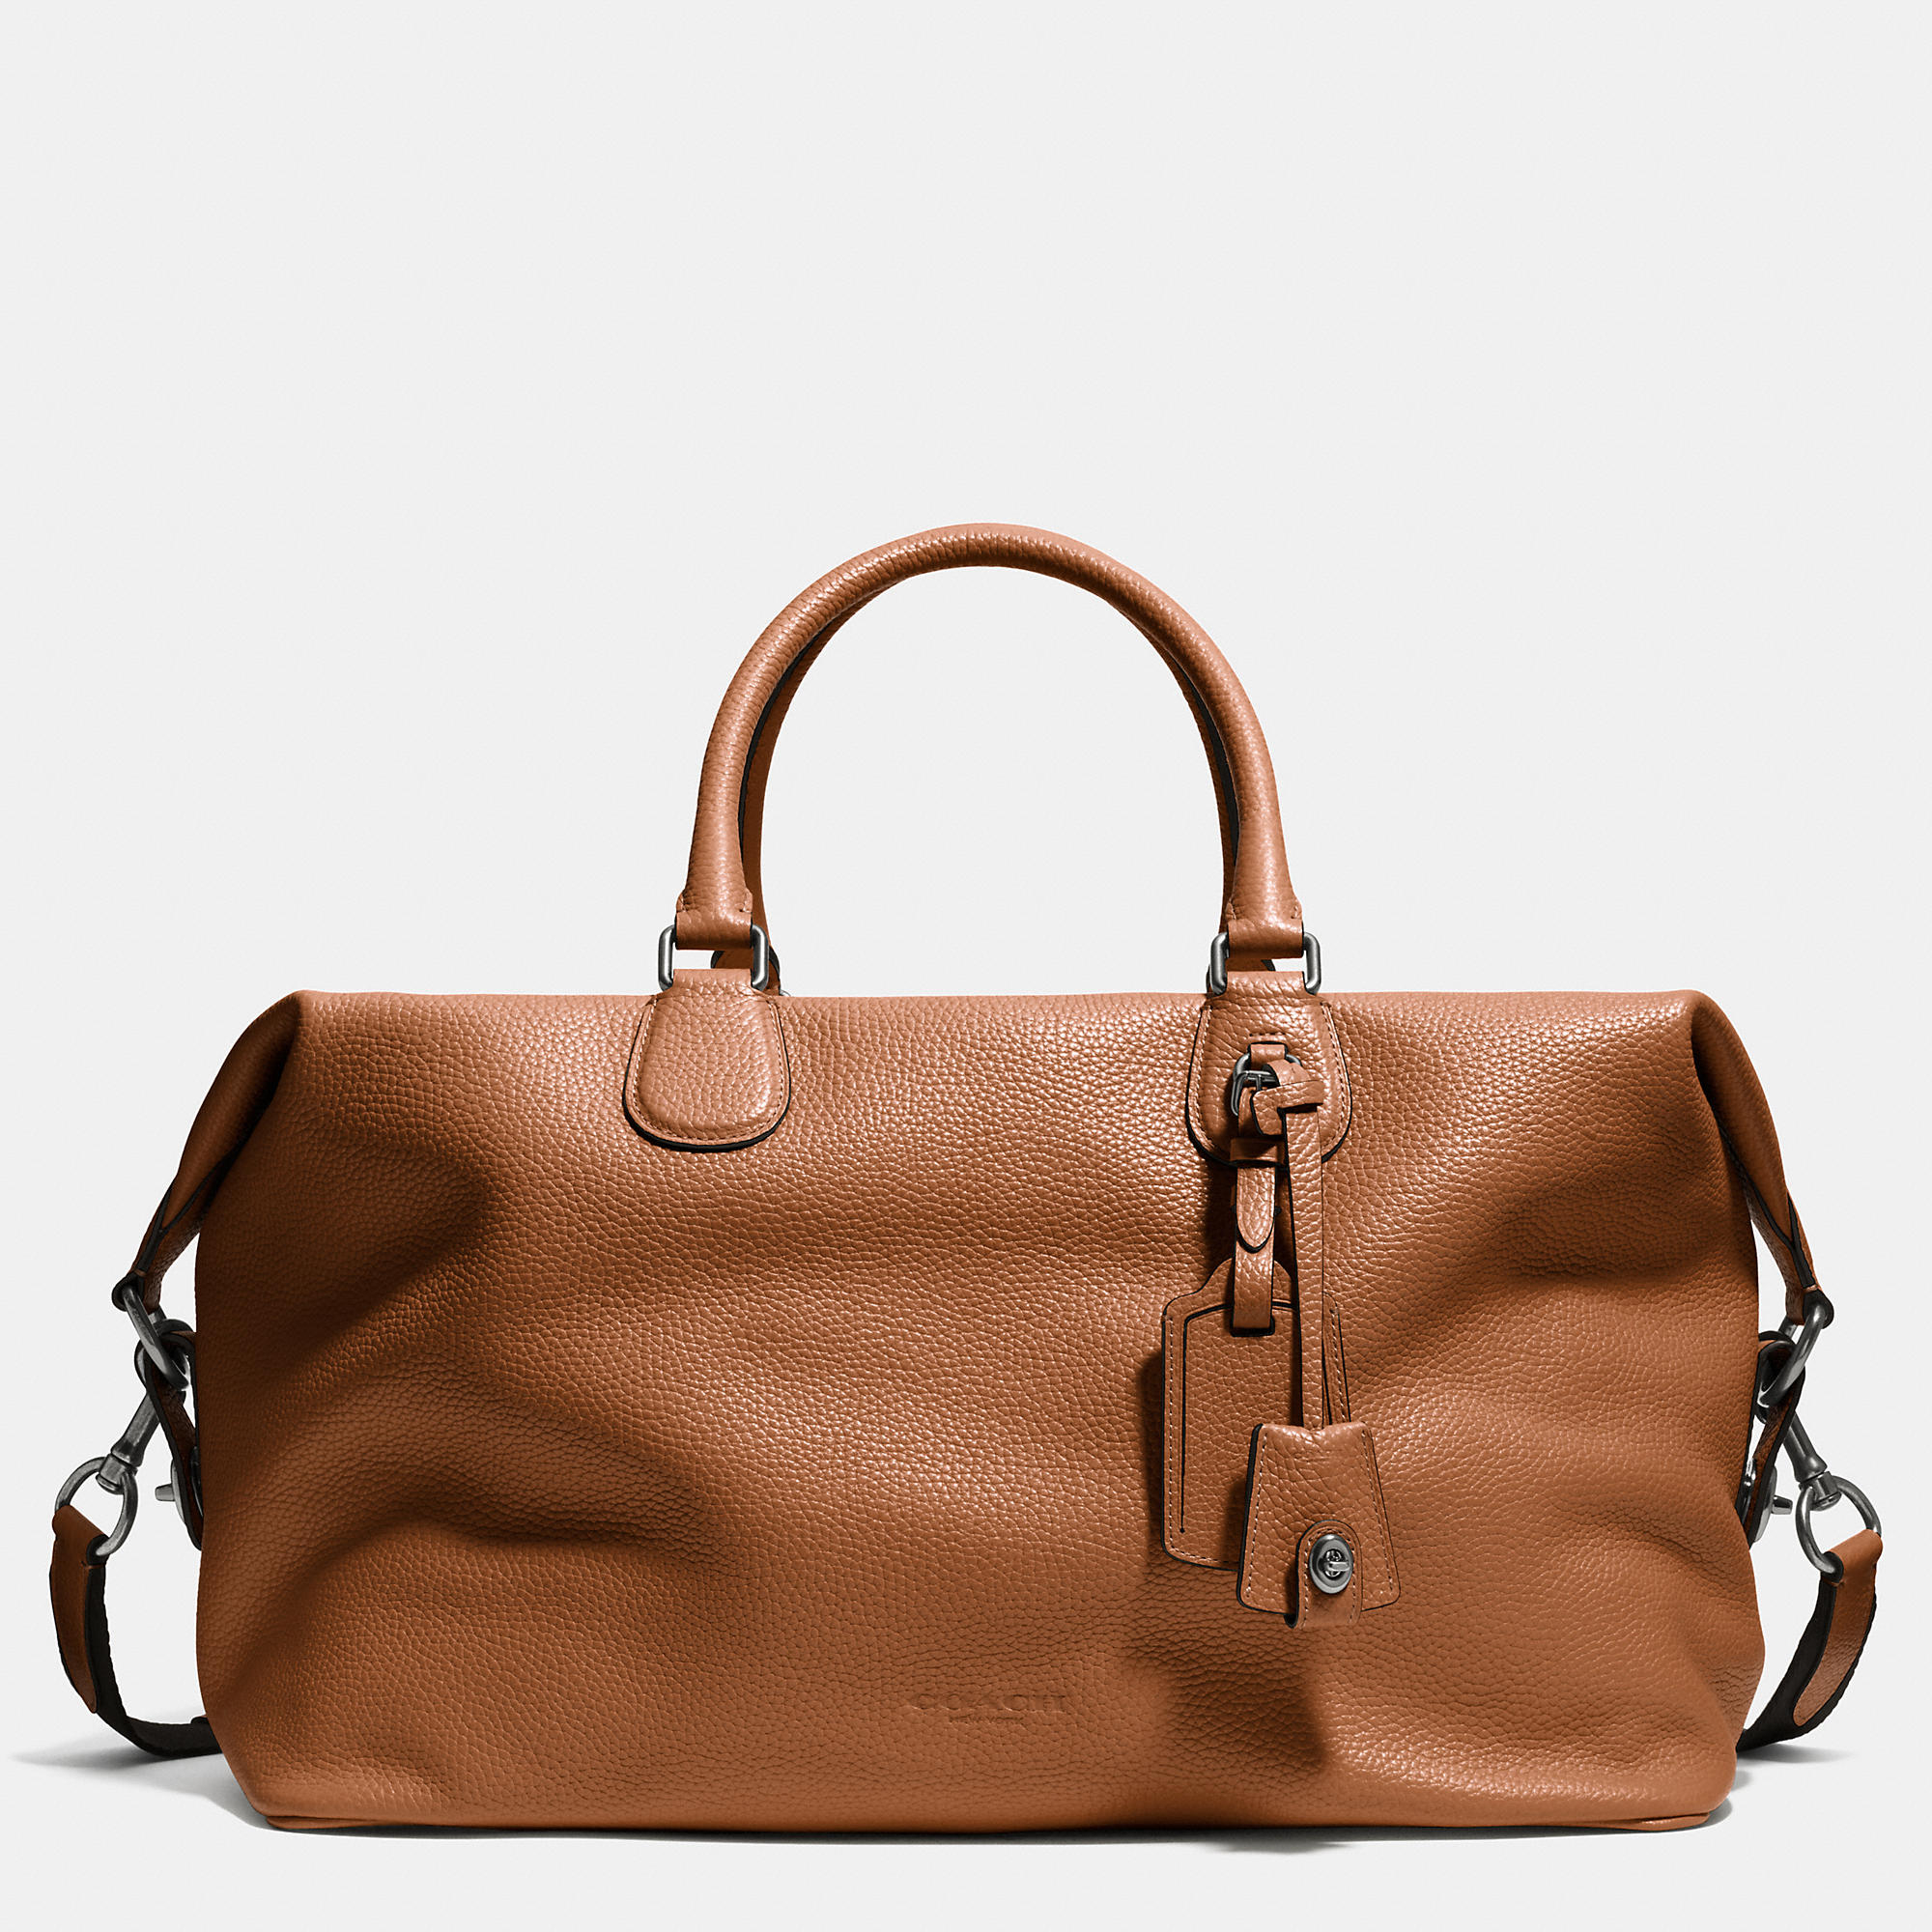 ecf48cd16 ... spain australia lyst coach explorer bag in pebble leather in brown for  men 230d7 07fbe 90367